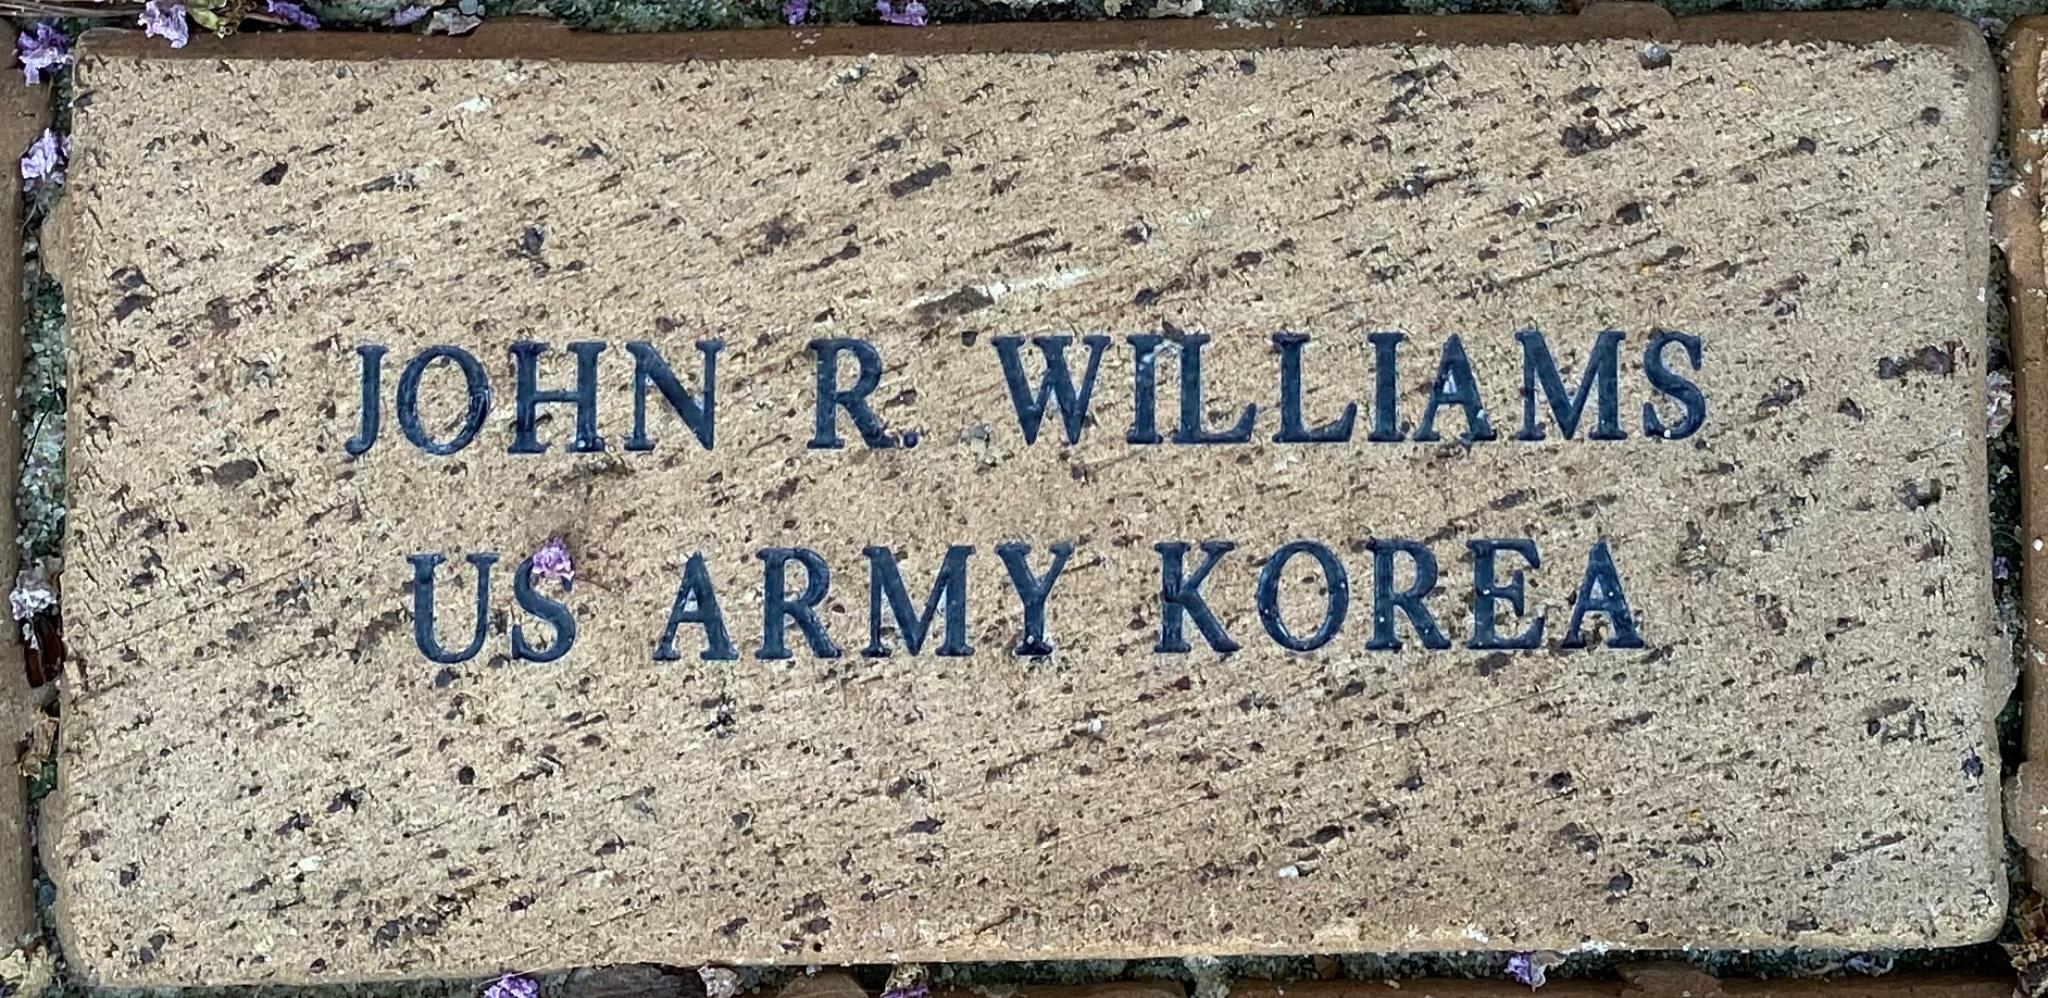 JOHN R WILLIAMS US ARMY KOREA